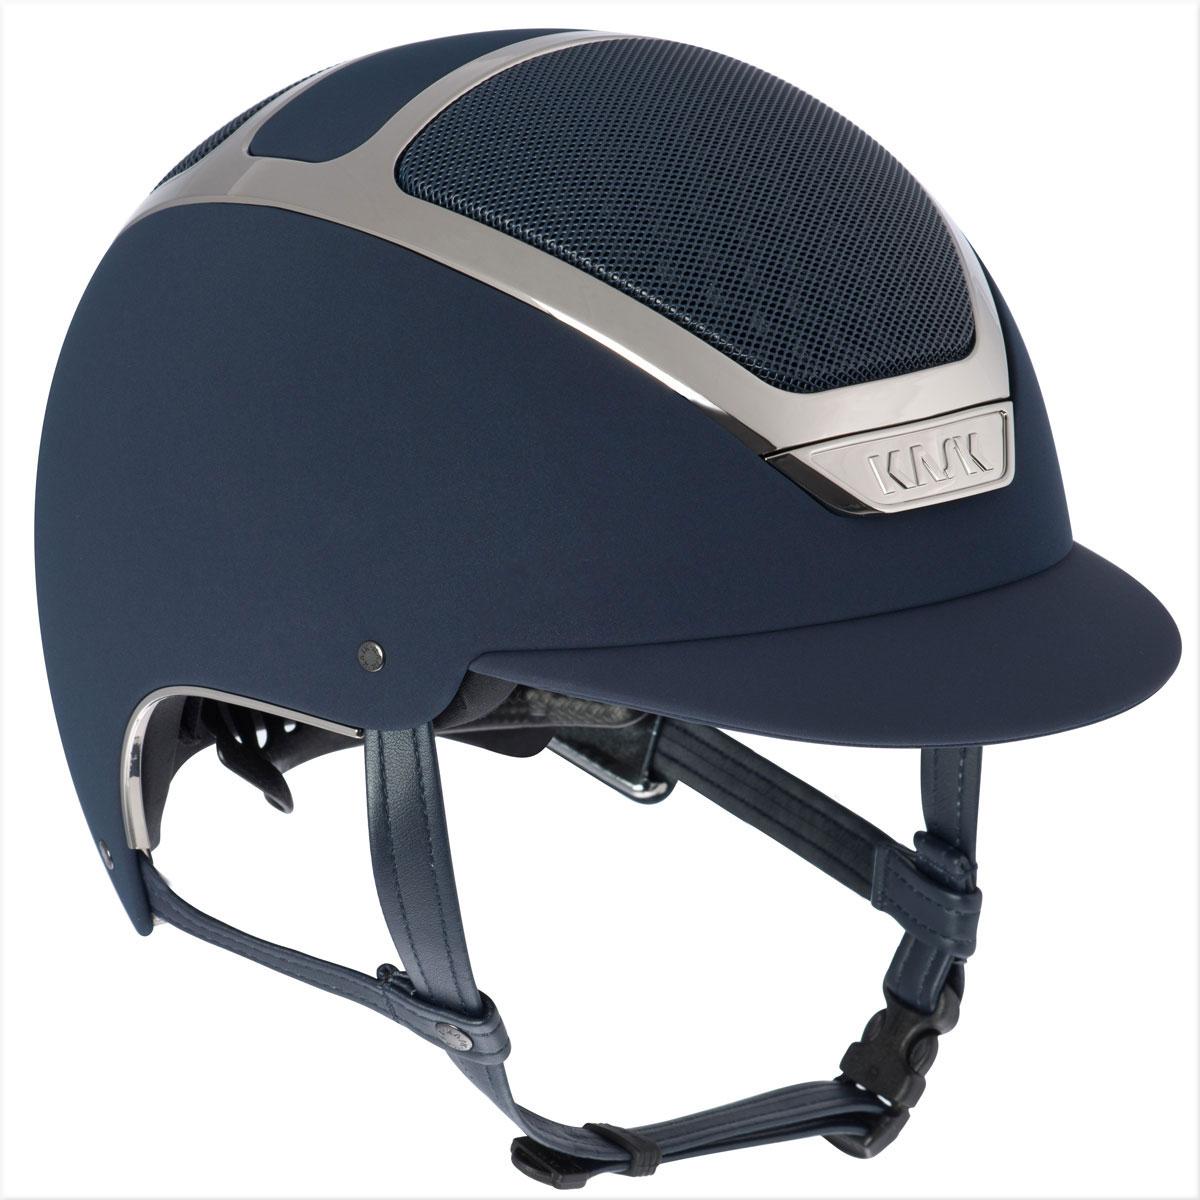 KASK Dogma Chrome Light Helmet - Clearance!